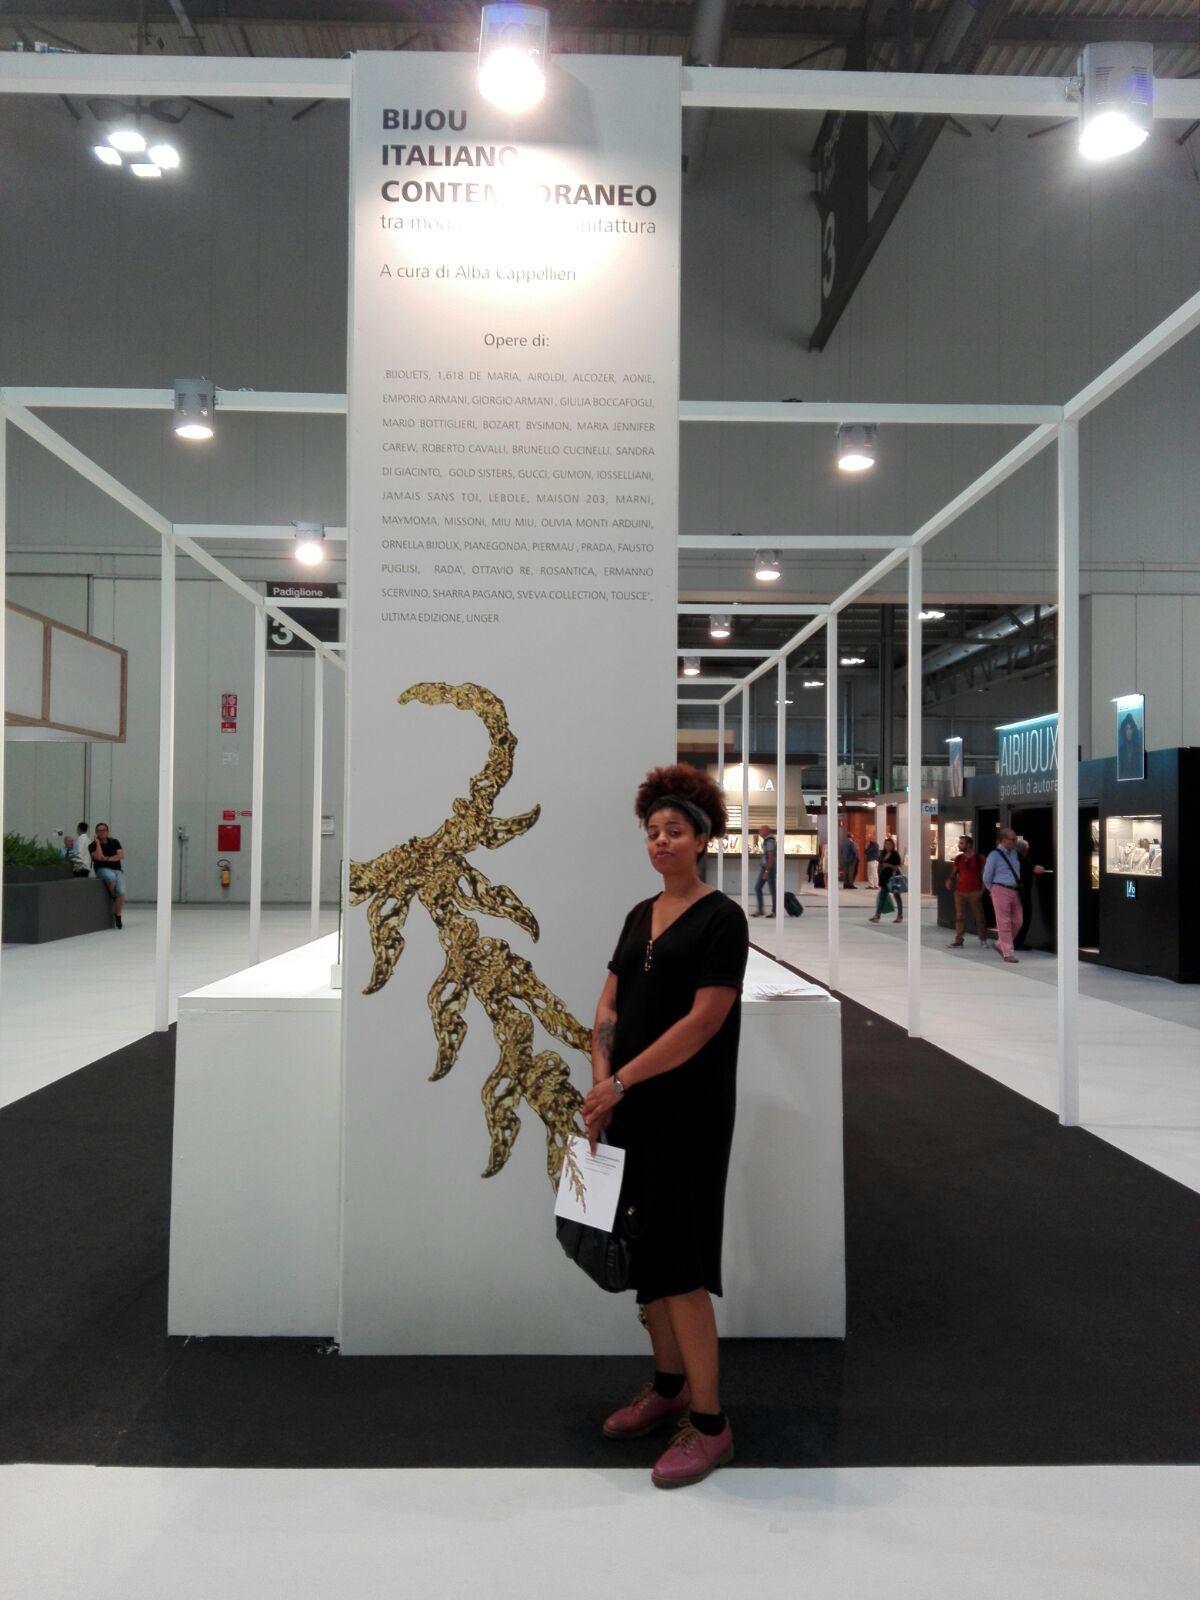 Bijou Italiano - Milan